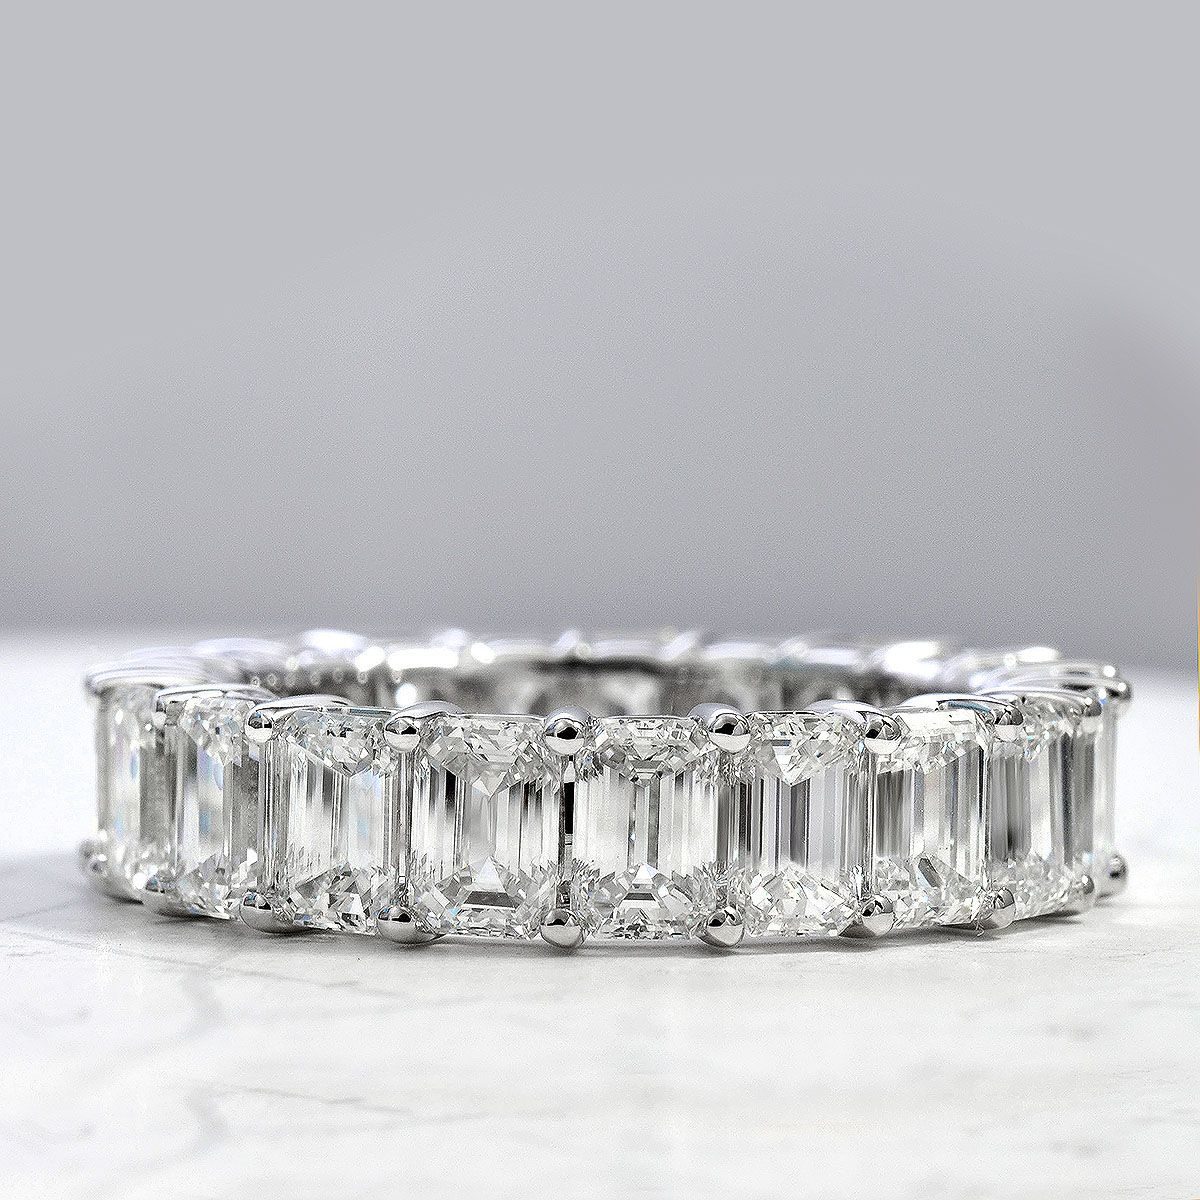 8 Ct Emerald Diamond Women Wedding Band Ring 18K White Gold Finish Eternity